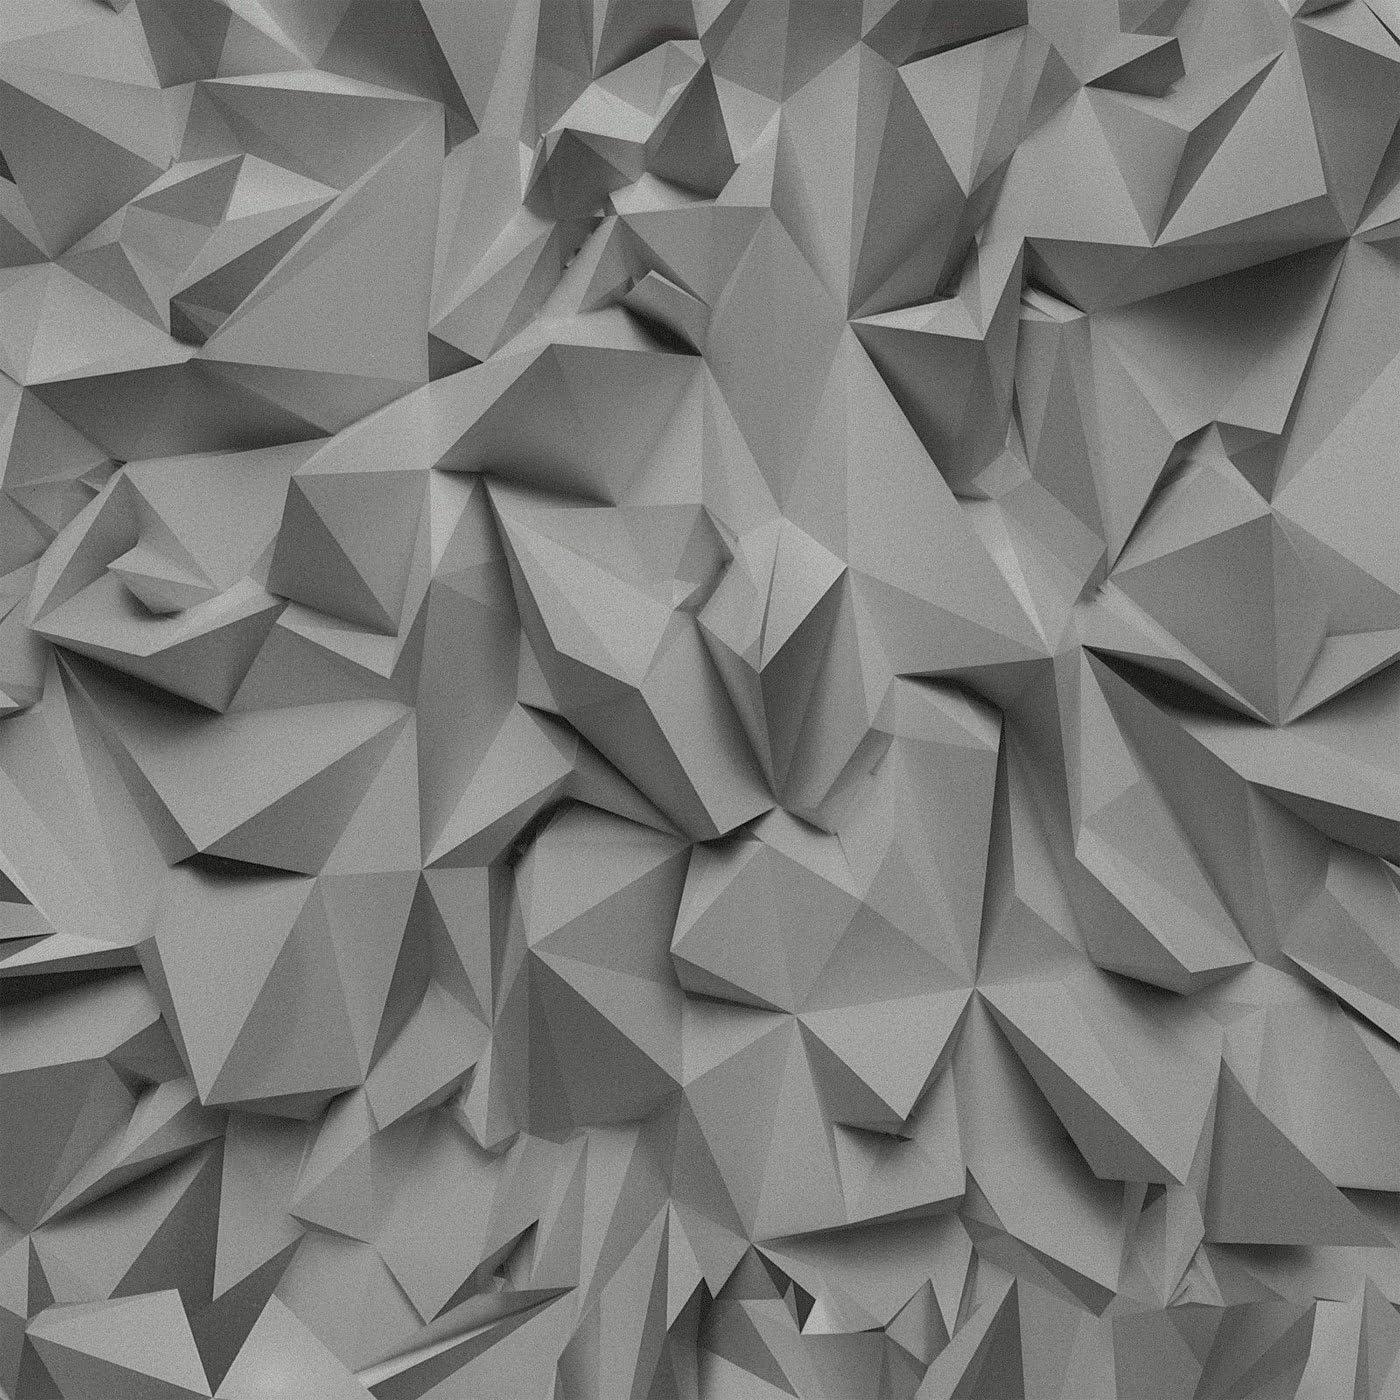 3D Effect Grey Silver Black Futuristic Metallic Vinyl Wallpaper